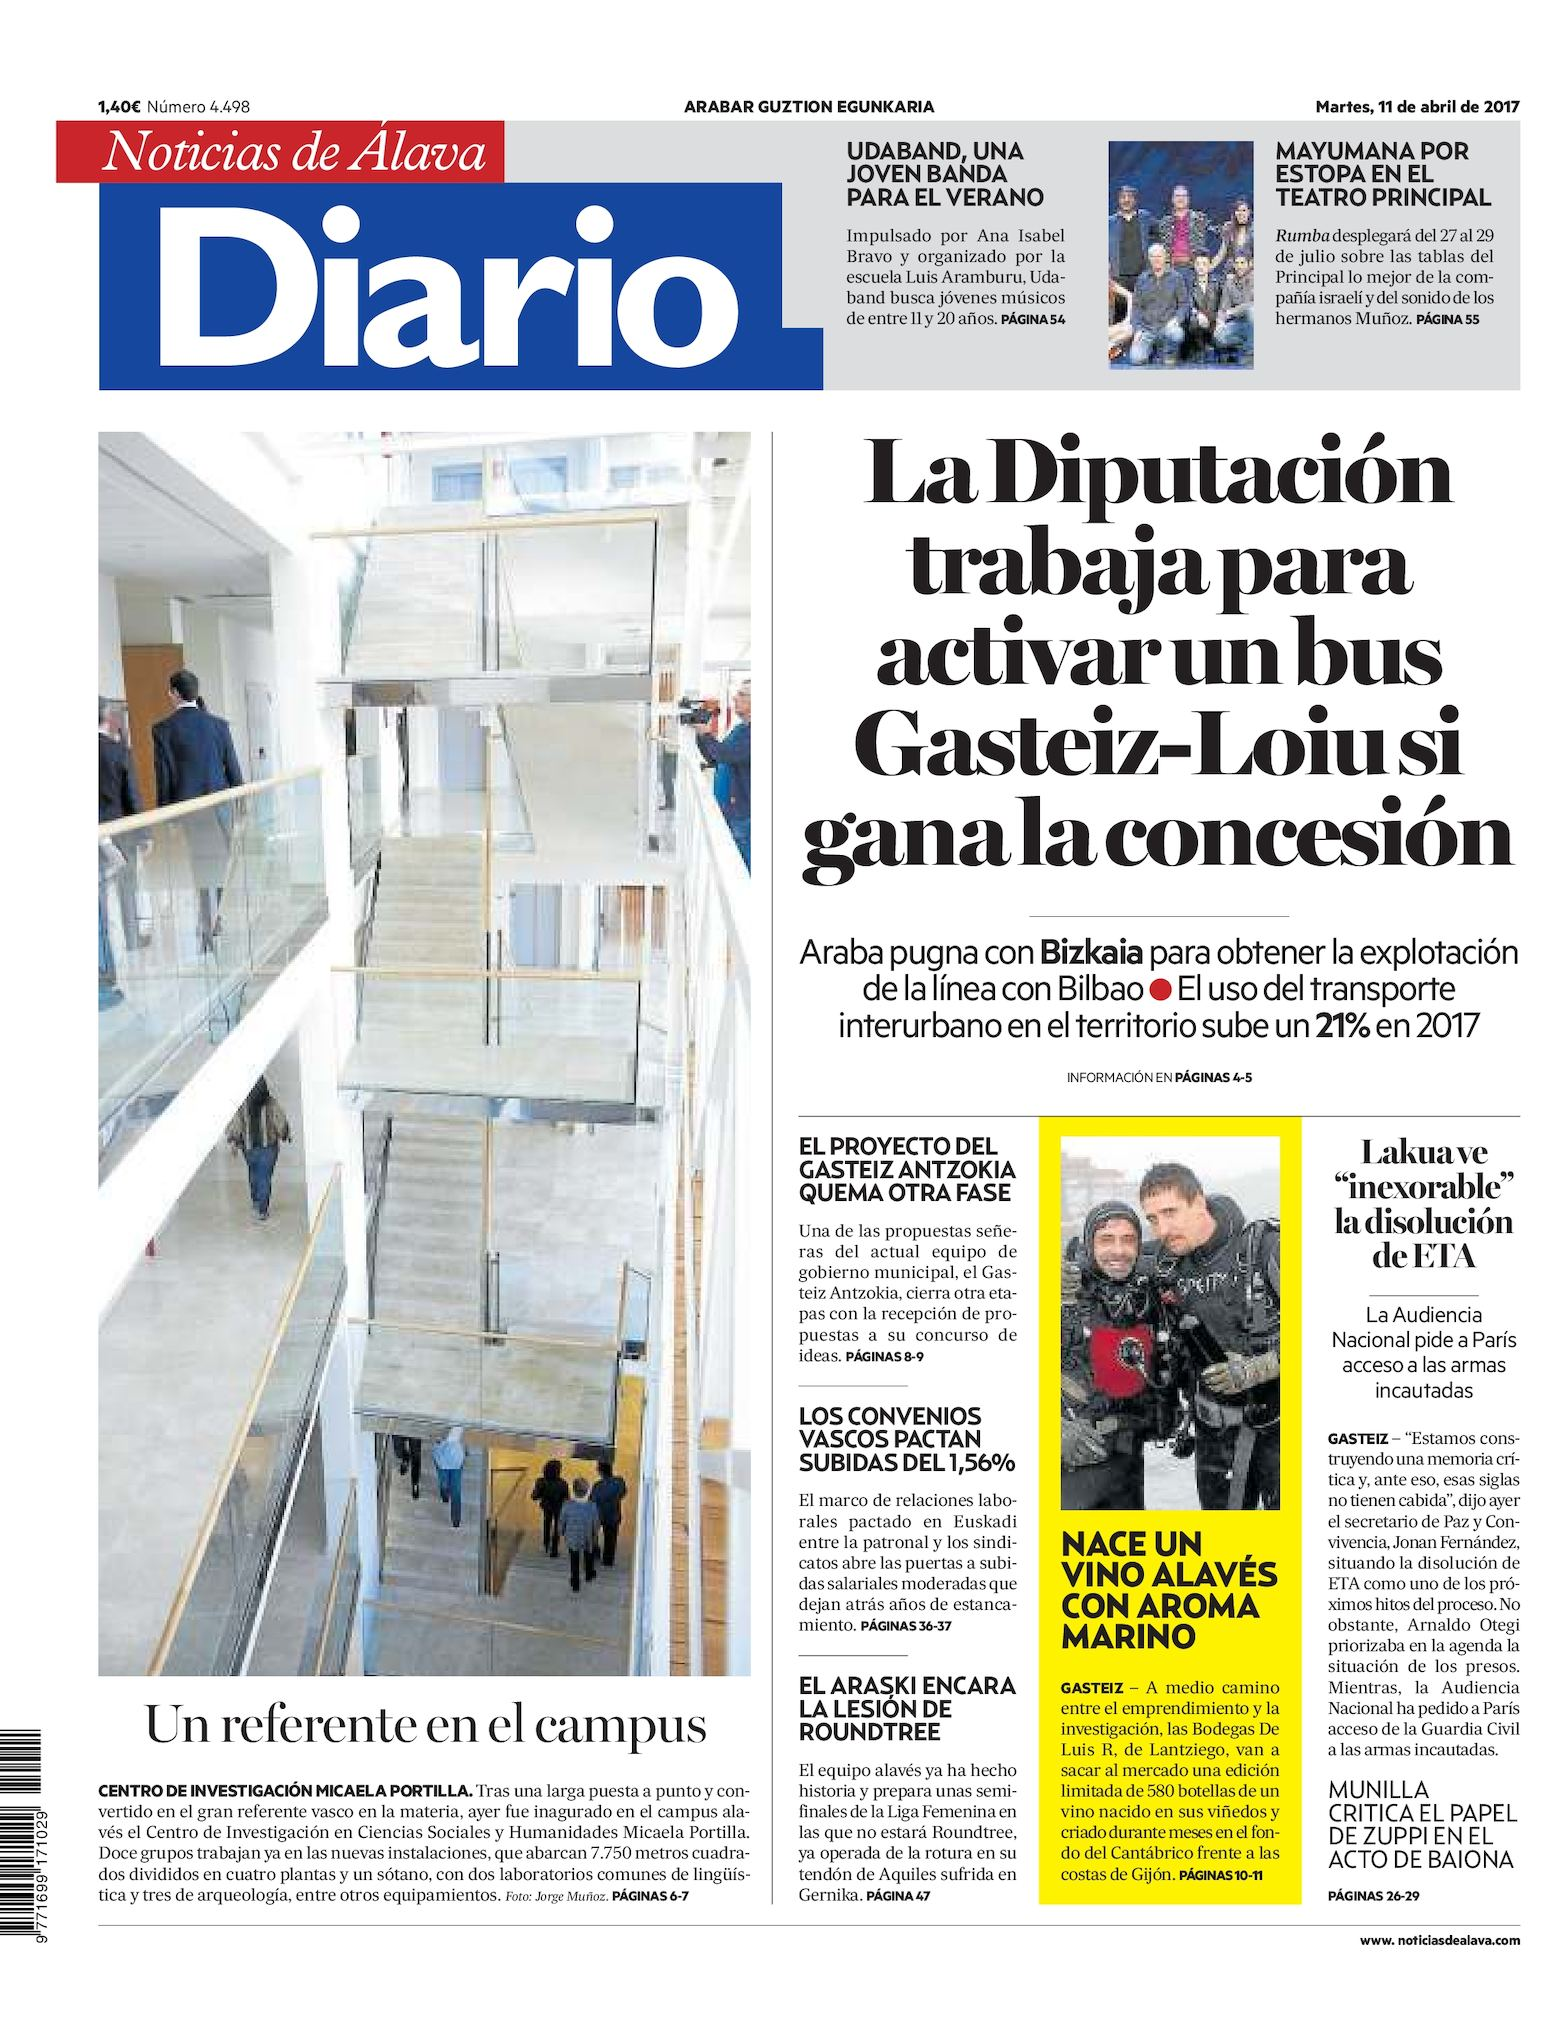 ce0ad42adf Calaméo - Diario de Noticias de Álava 20170411